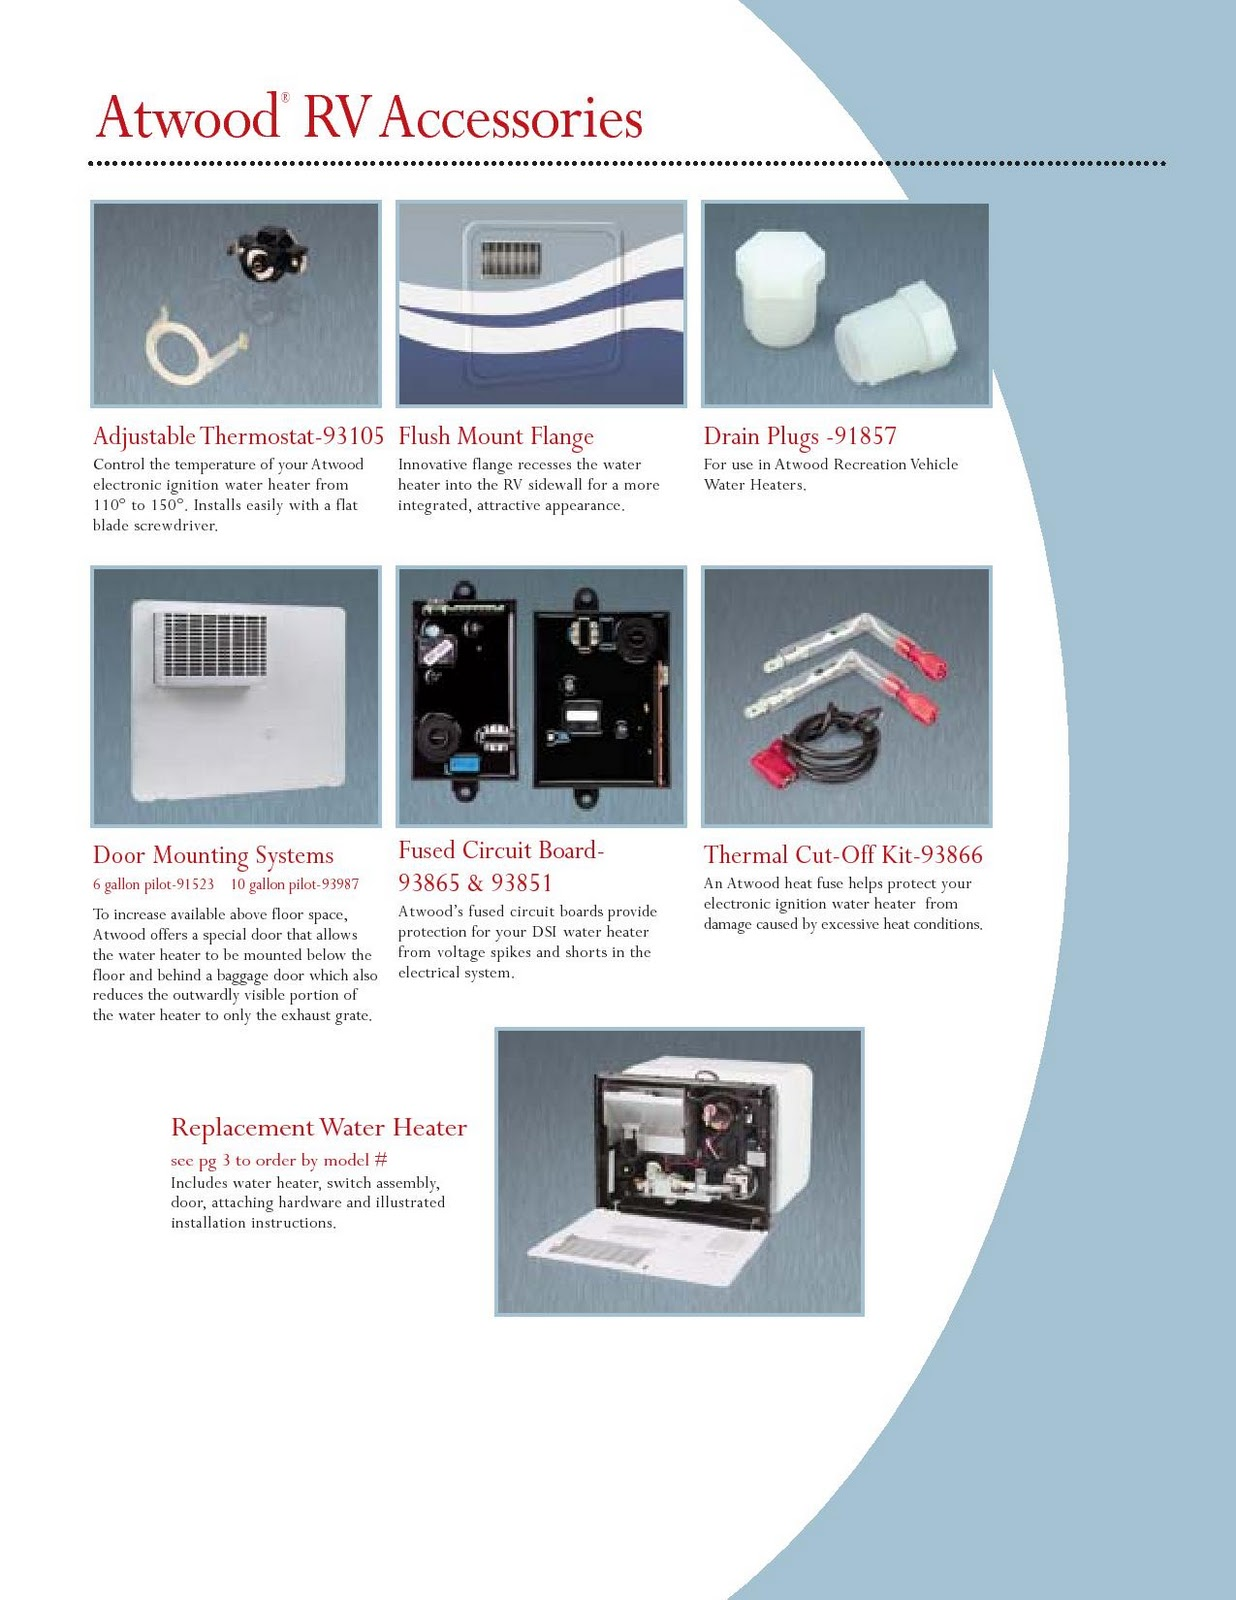 medium resolution of atwood water heater brochure